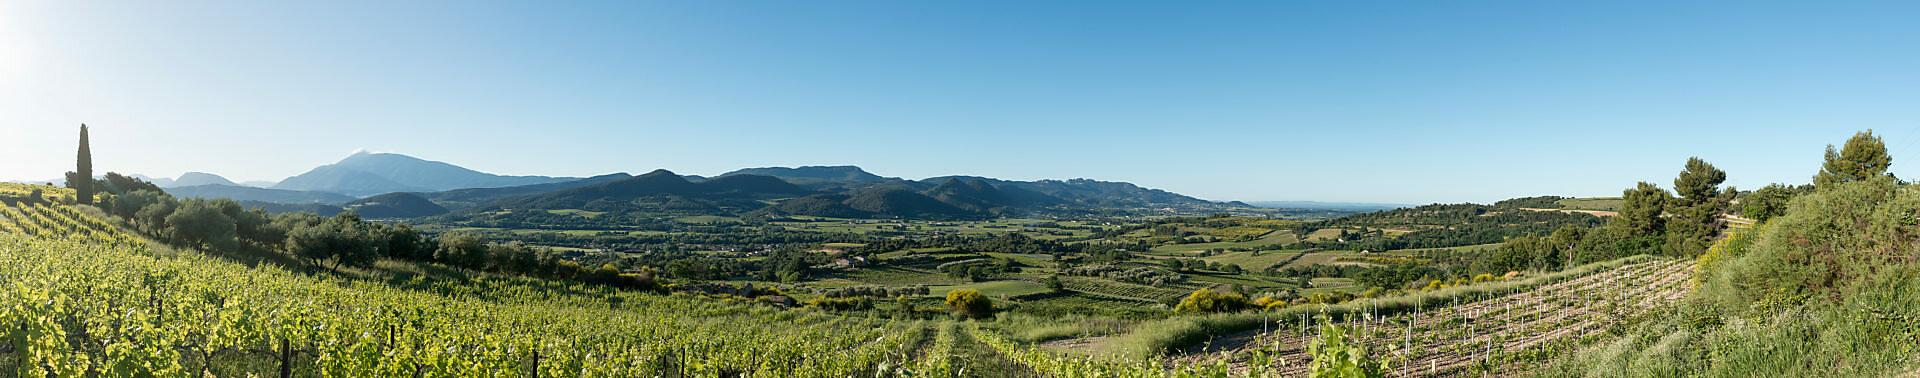 Roaix, Vaucluse, Provence, Provence-Alpes-Côte d'Azur, France, vineyards with Roaix, Arondissement Carpentras, in the background of the Mont Ventoux,